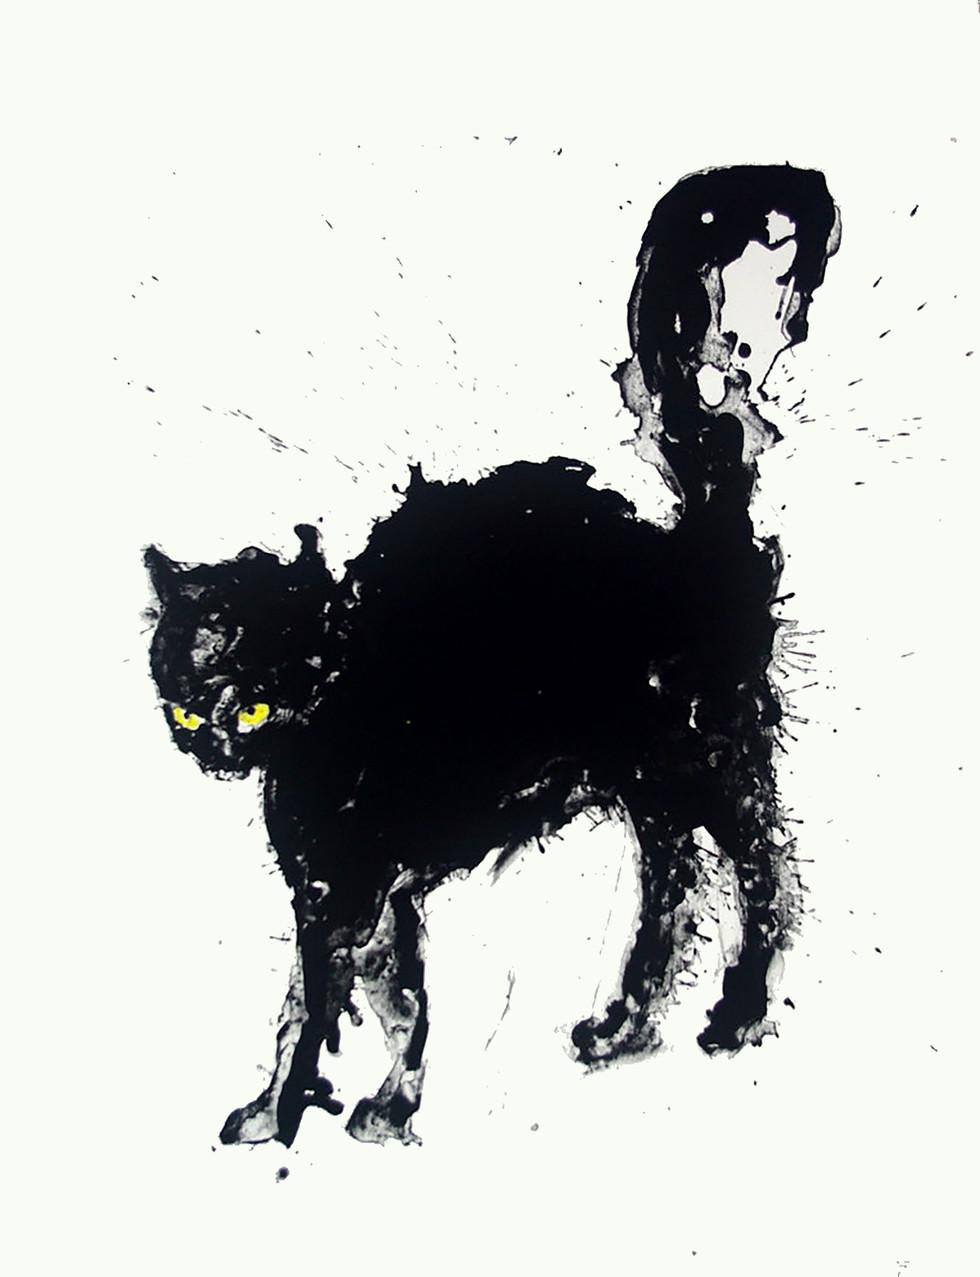 Jane Sampson 'Black Cat' Silkscreen Personal Project 56 x 76cm Edn 20